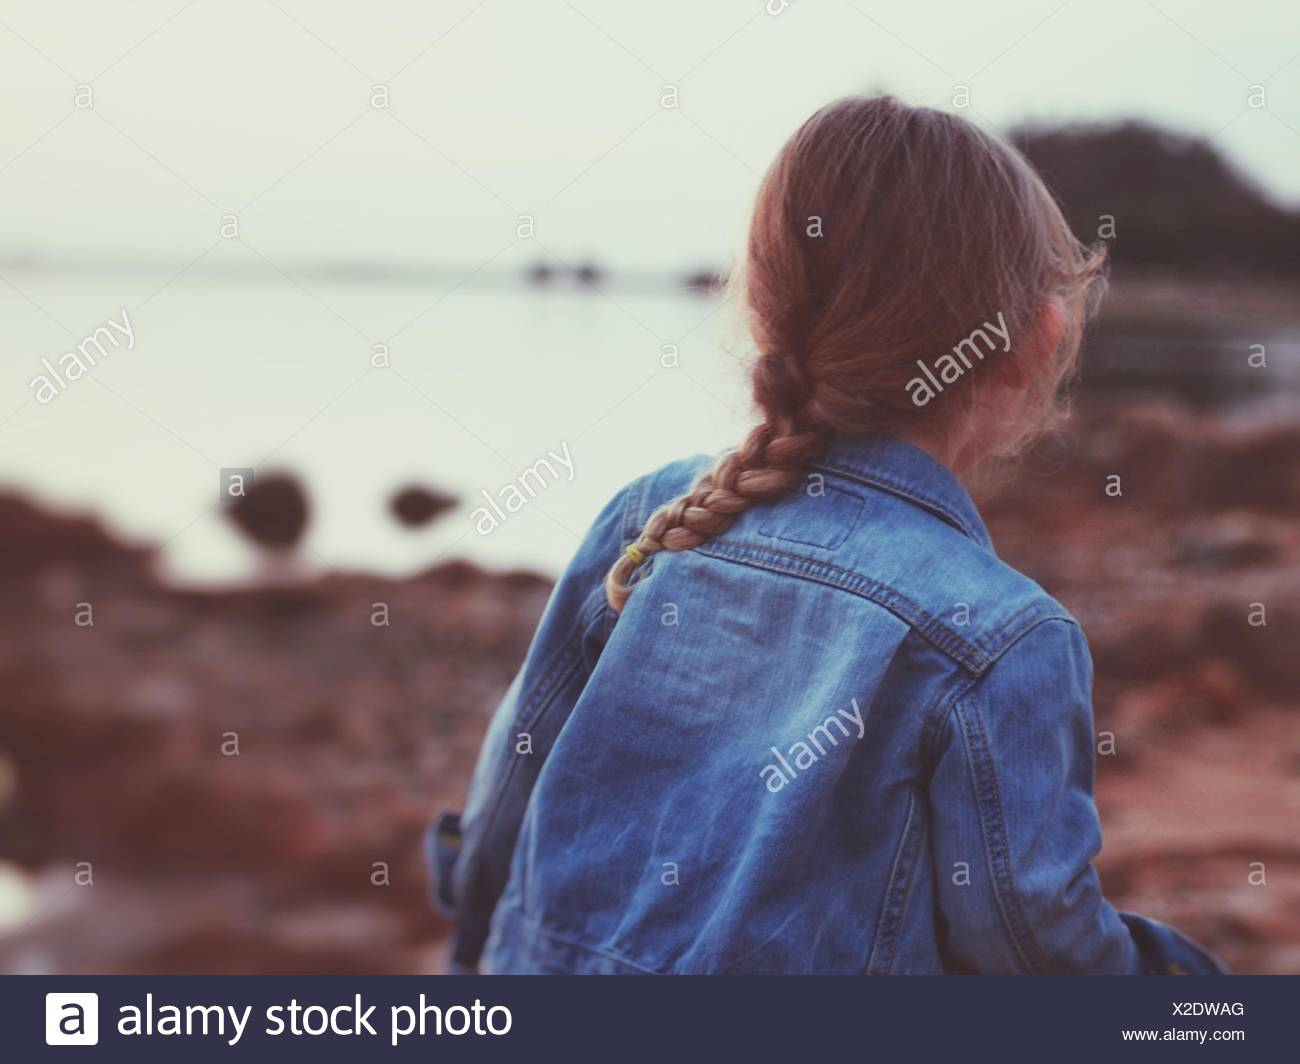 Rückansicht des Mädchens tragen Jeansjacke am Strand Stockbild